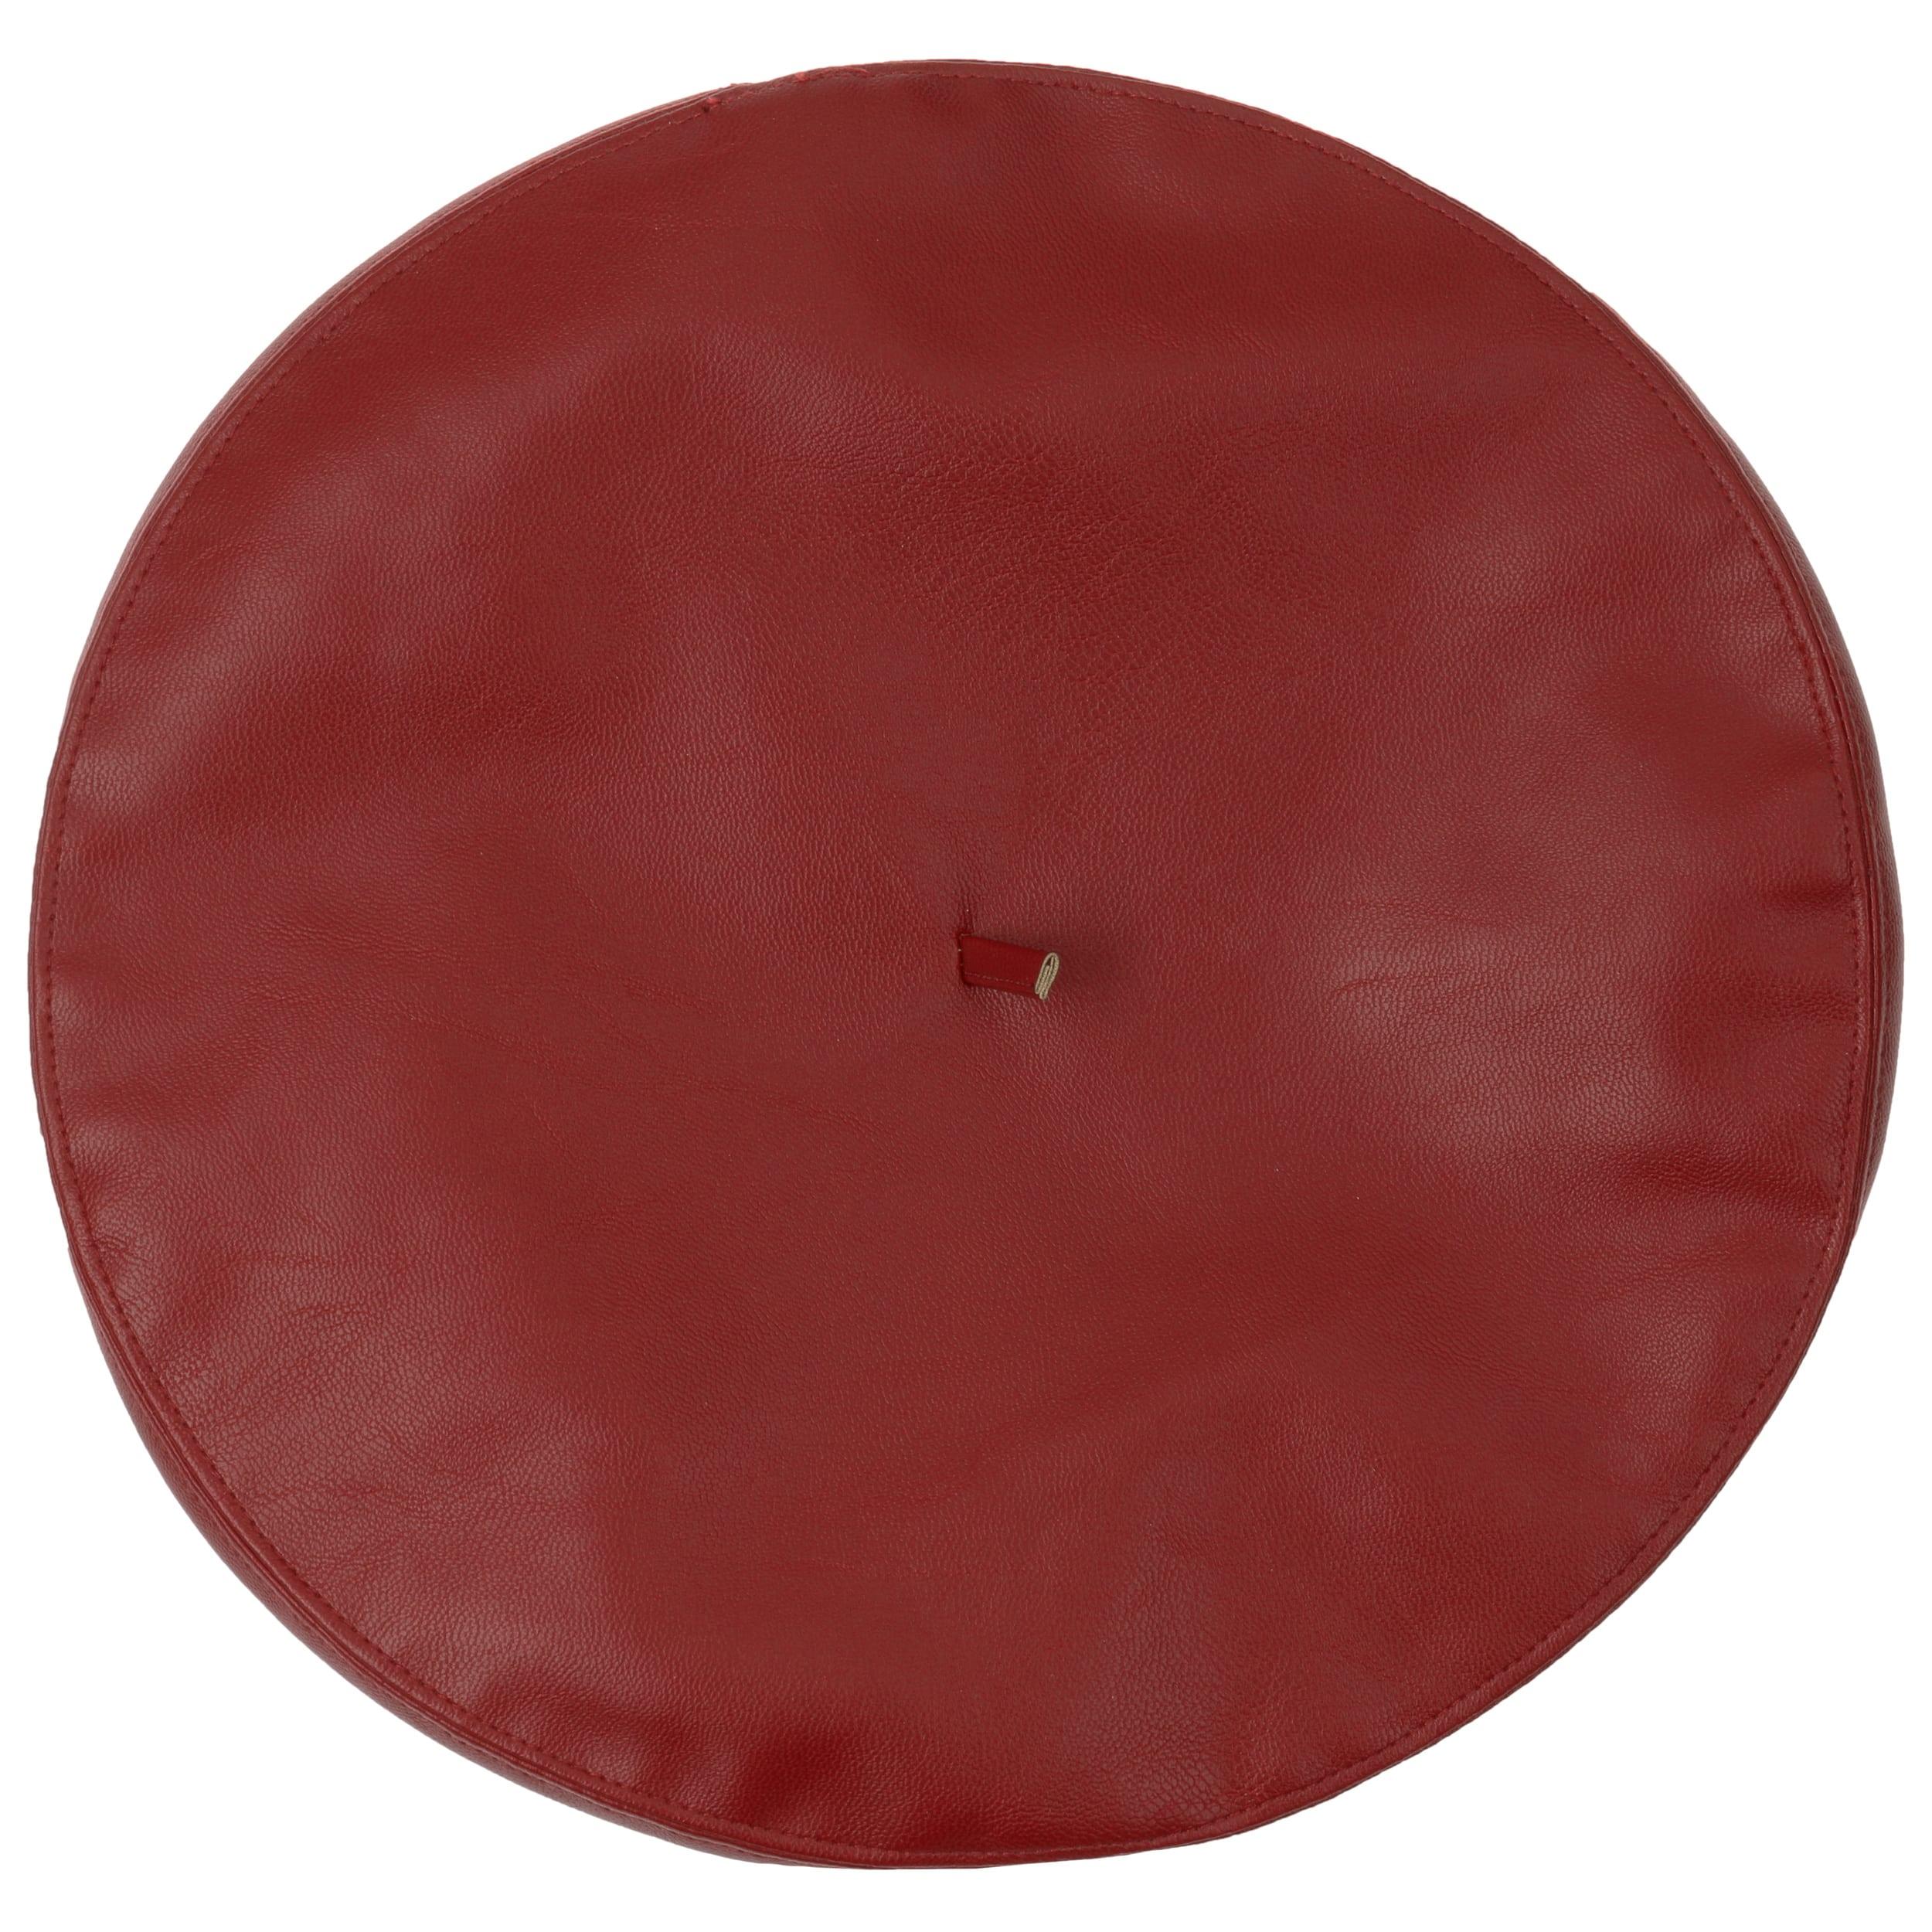 d1e281691bb7b Faux Leather Beret by Lipodo - bordeaux 1 ...